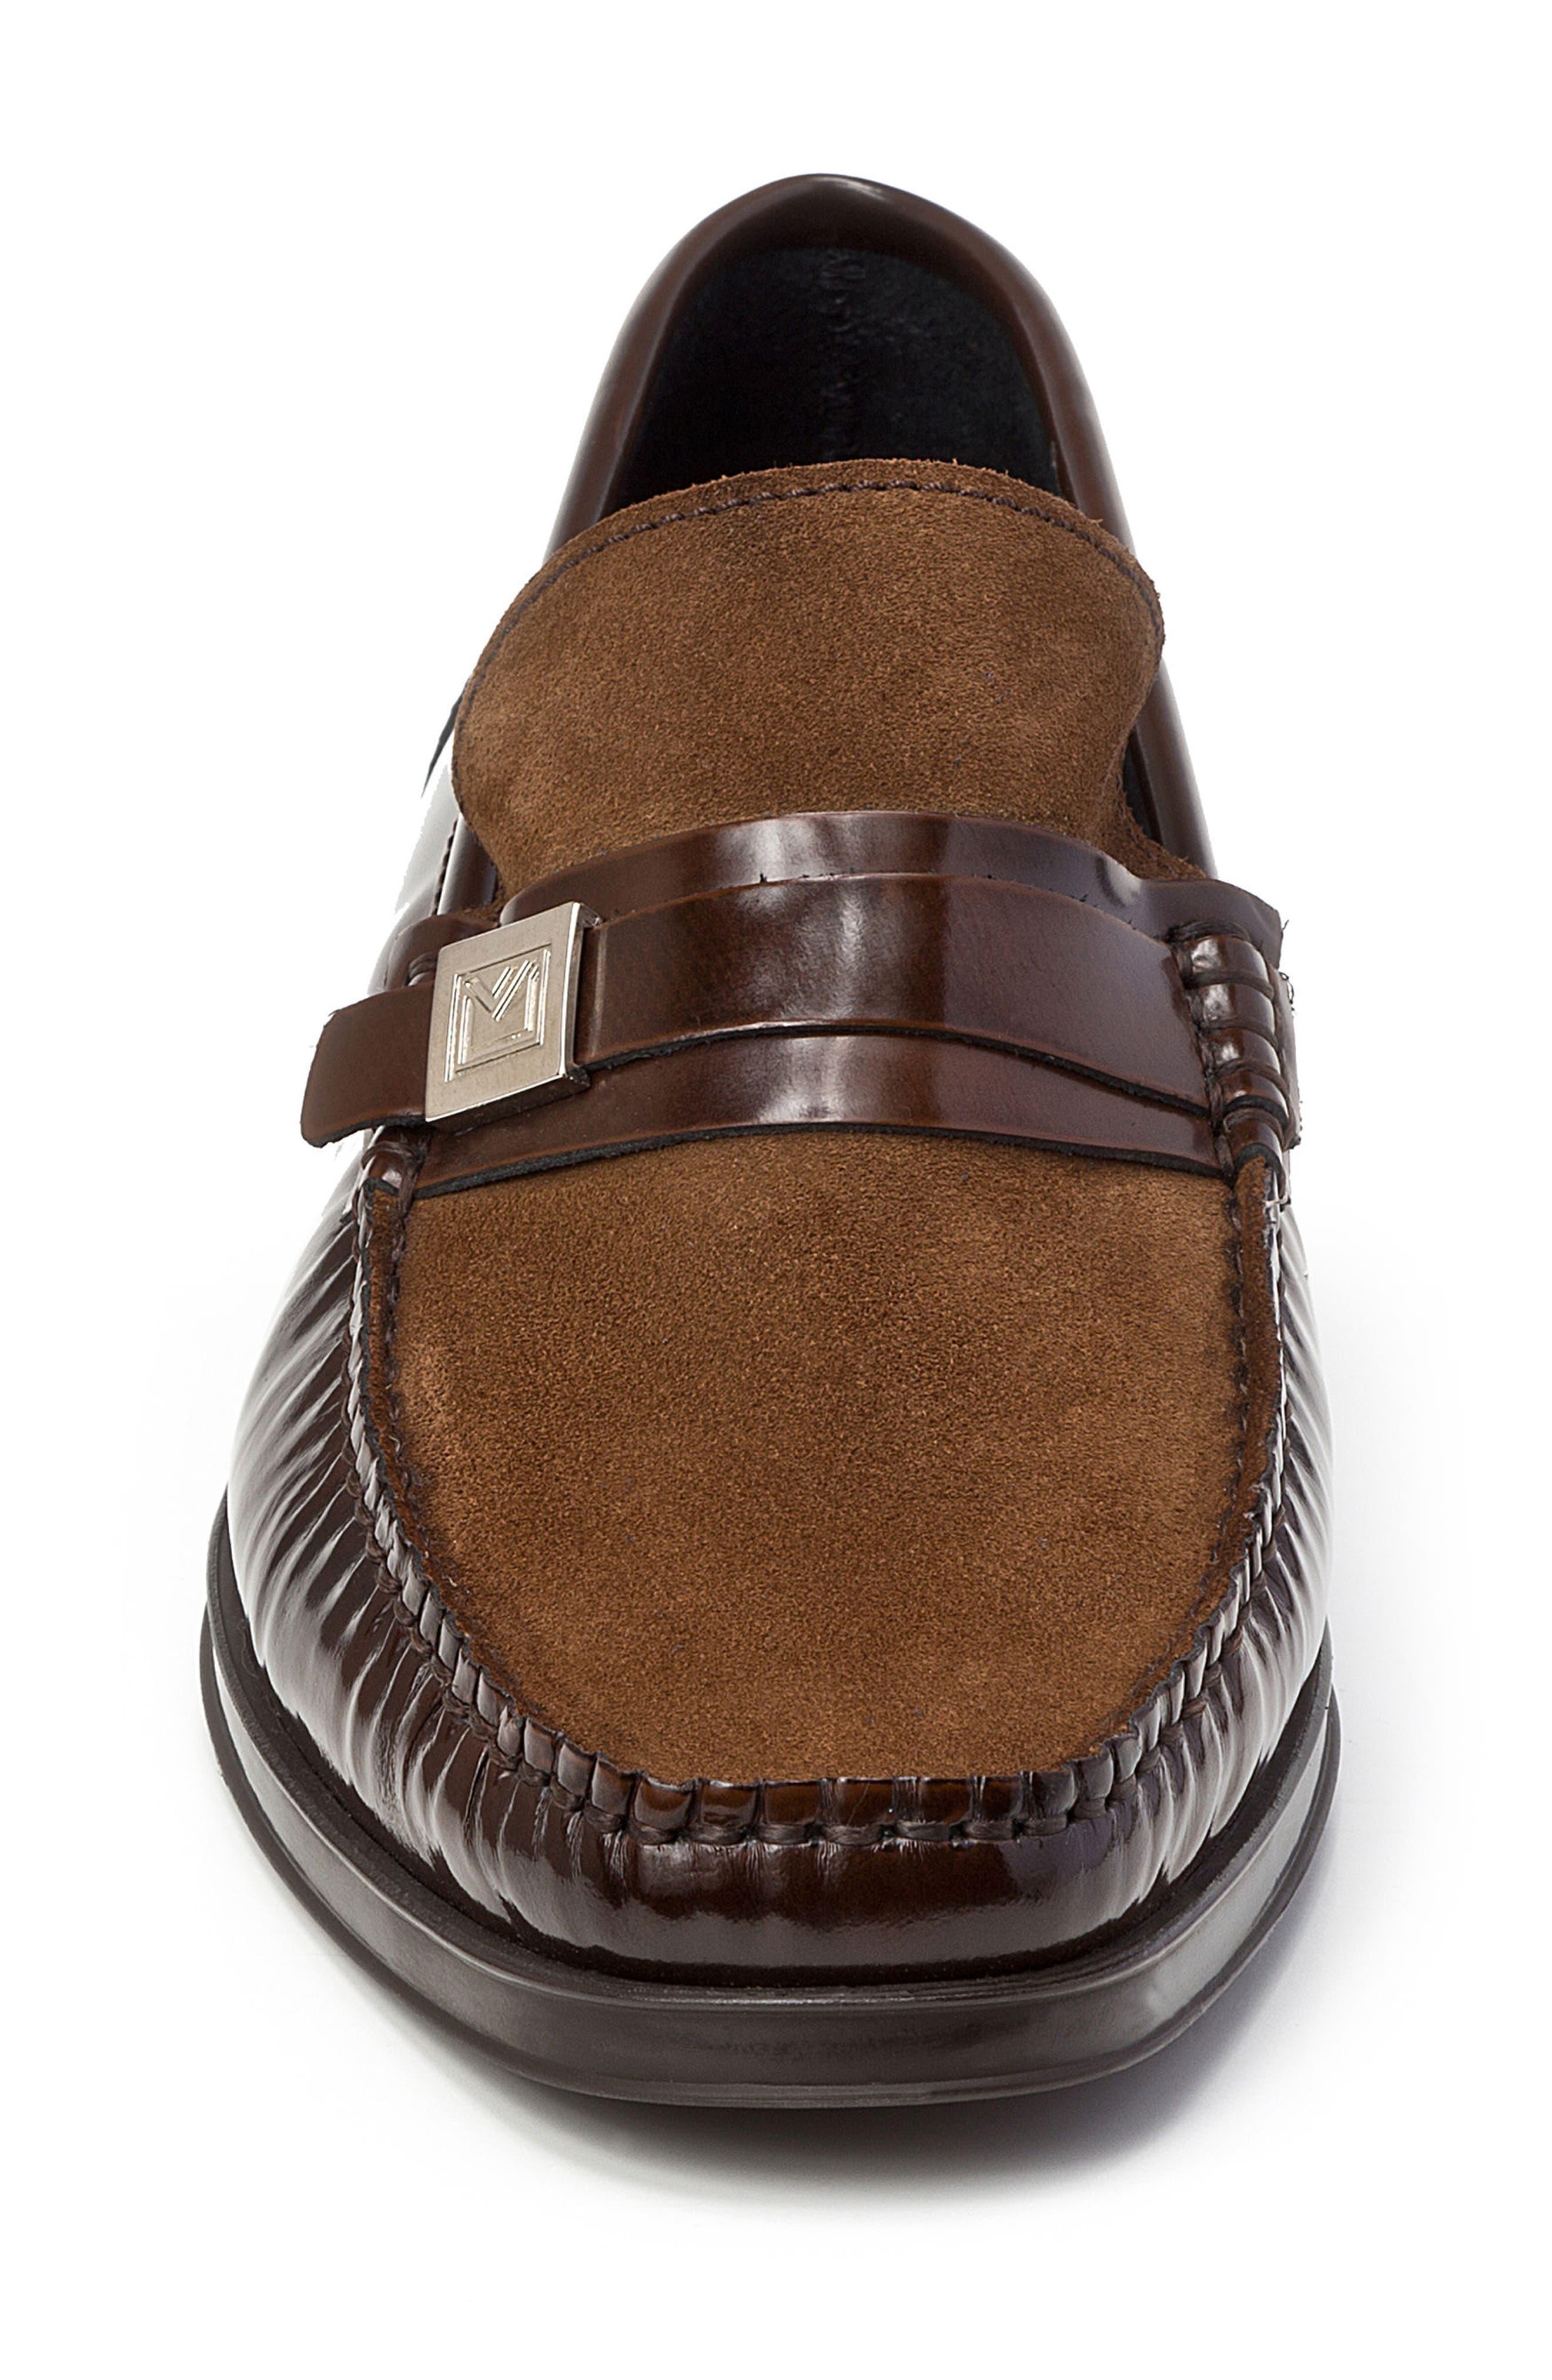 Avila Loafer,                             Alternate thumbnail 4, color,                             Brown Leather